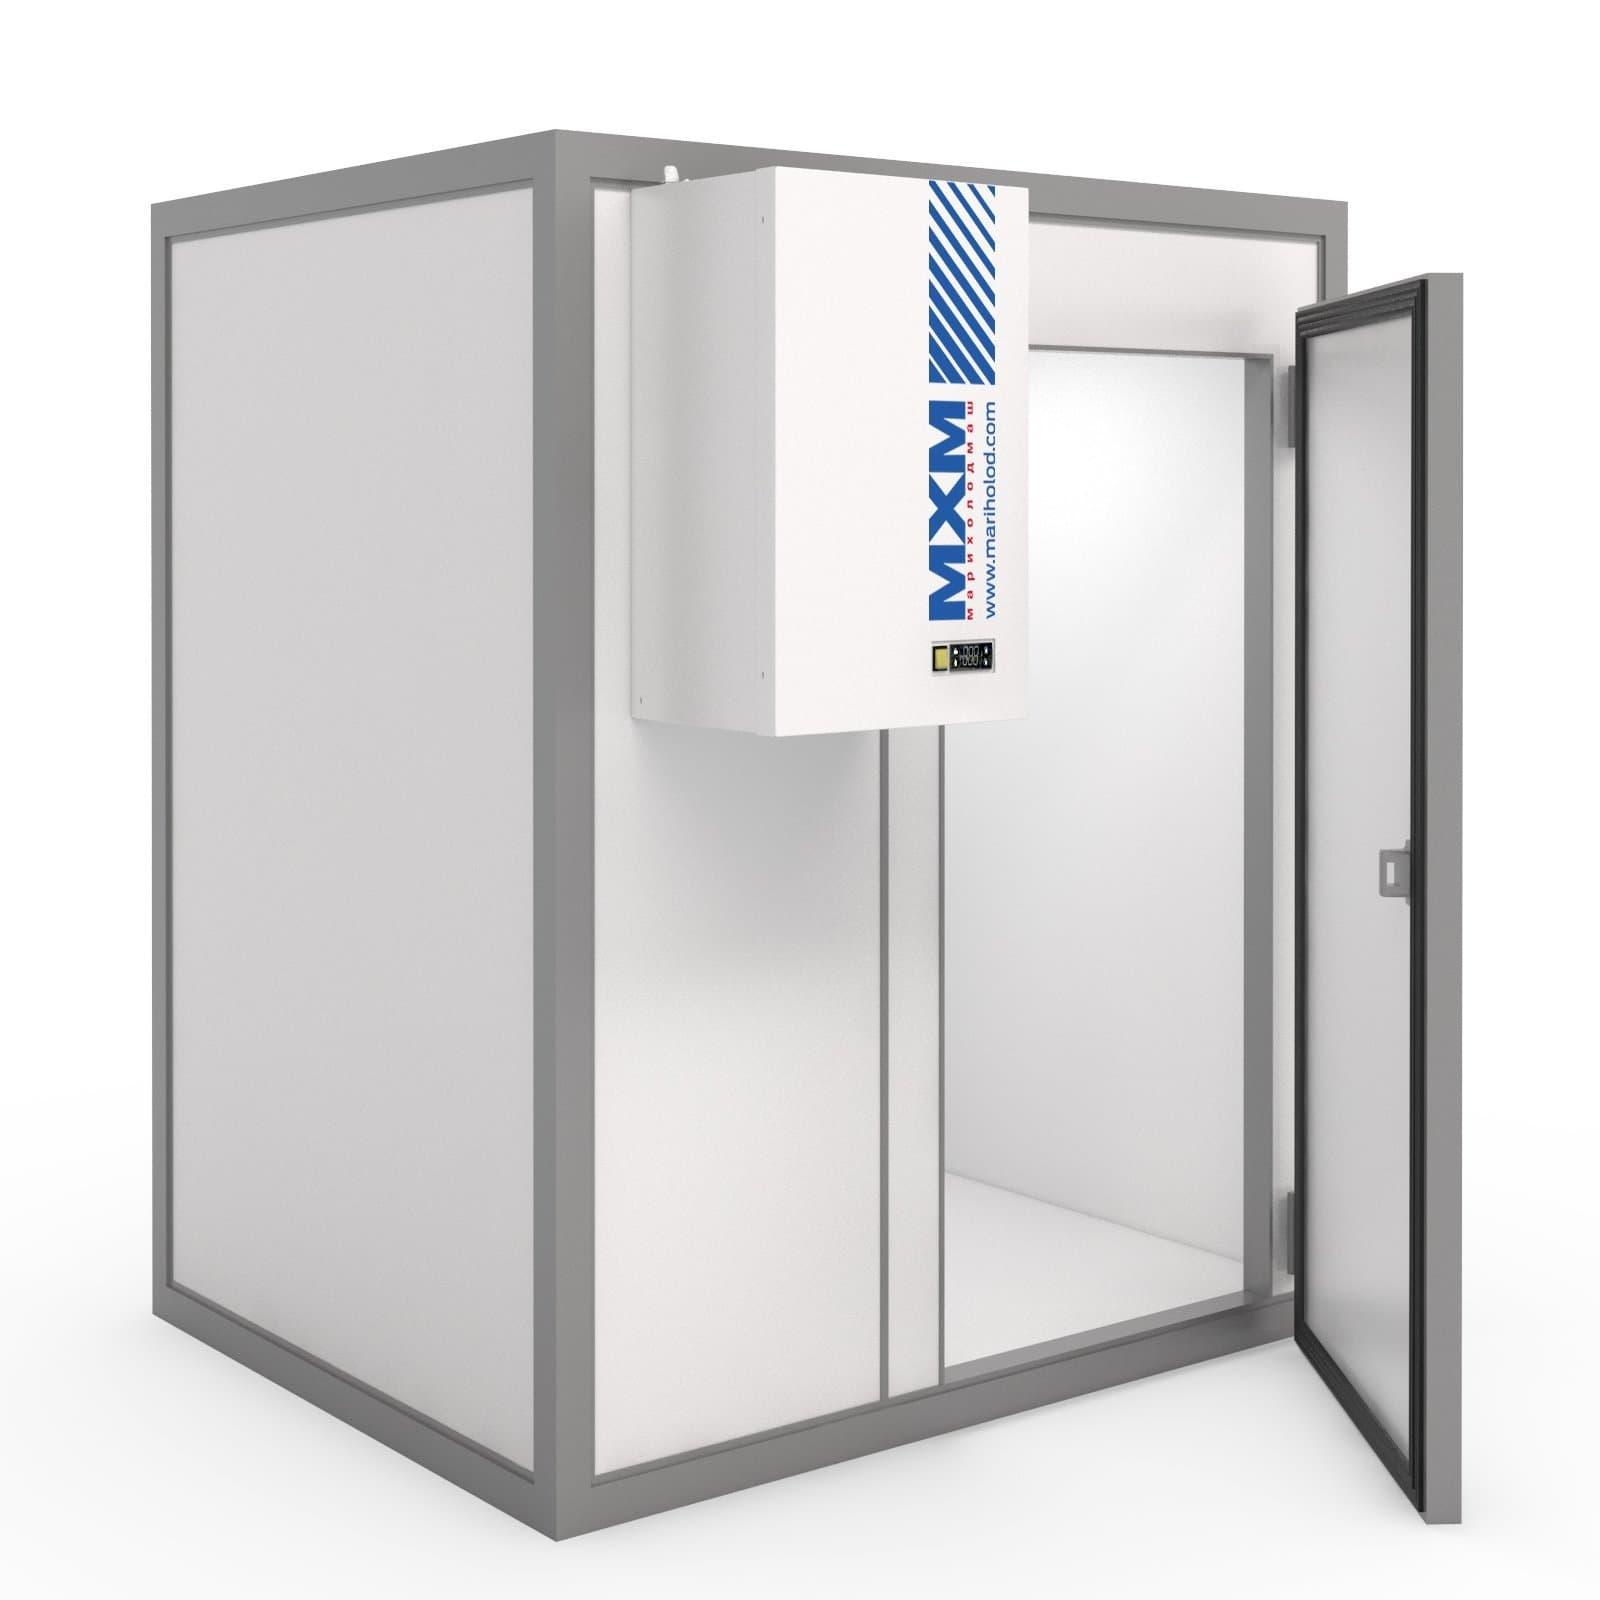 Камера холодильная МХМ КХН-14,52 2260×2860×2720